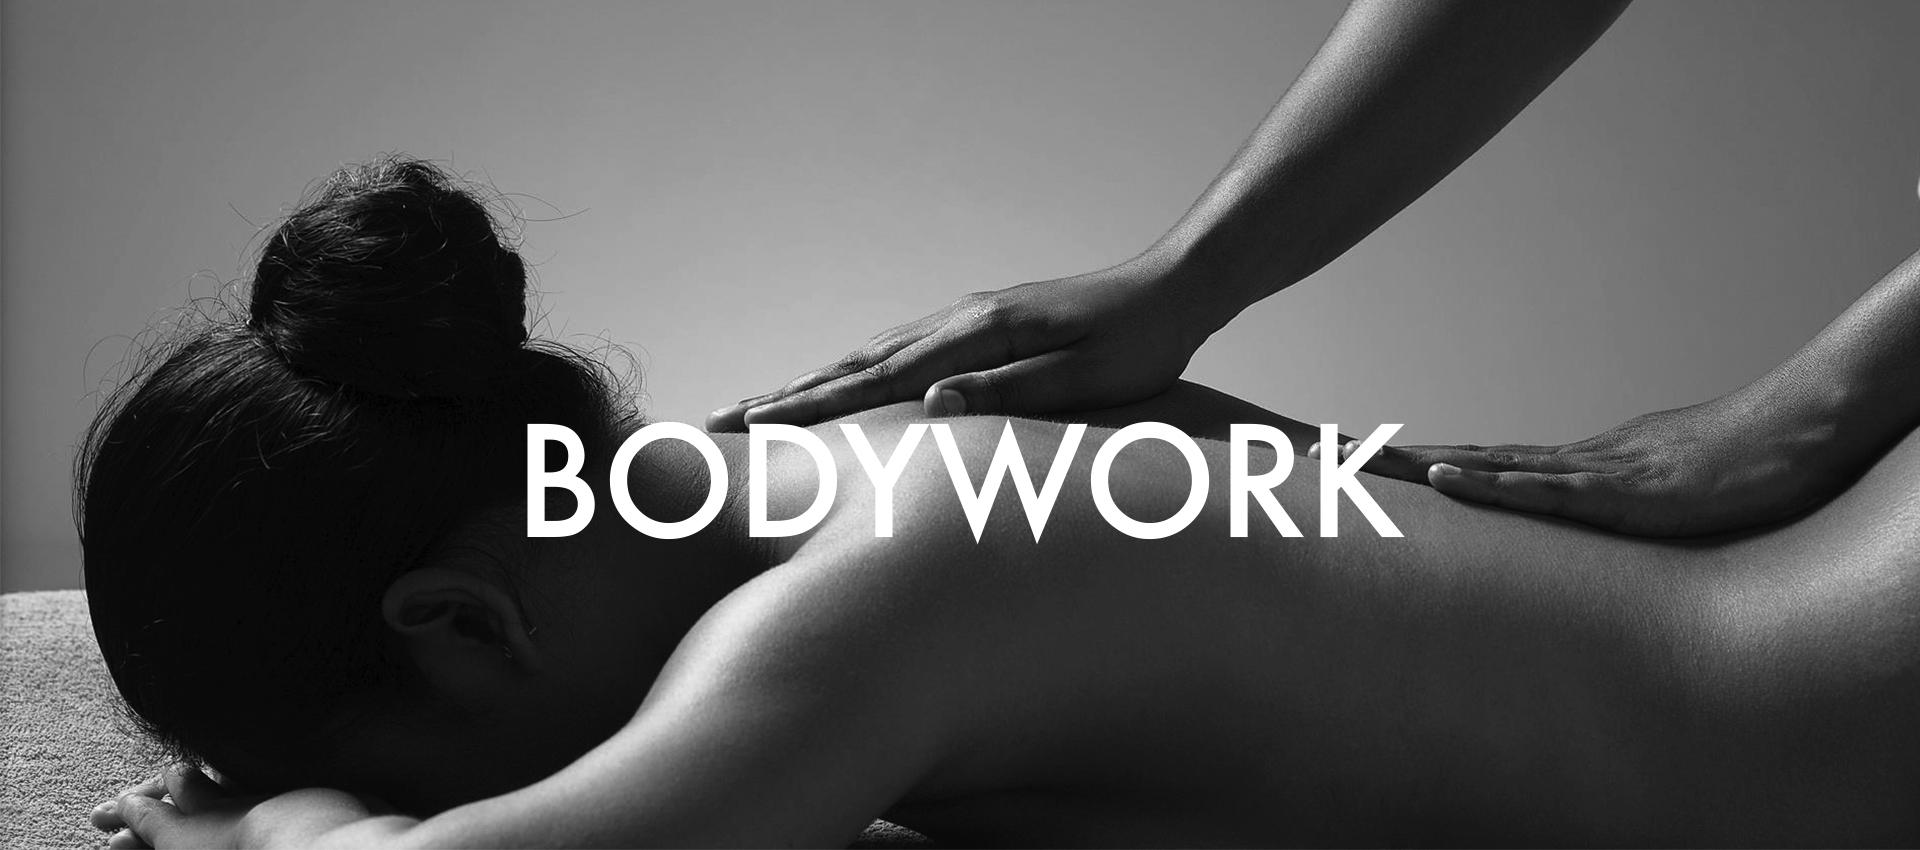 bodyworkslidebw